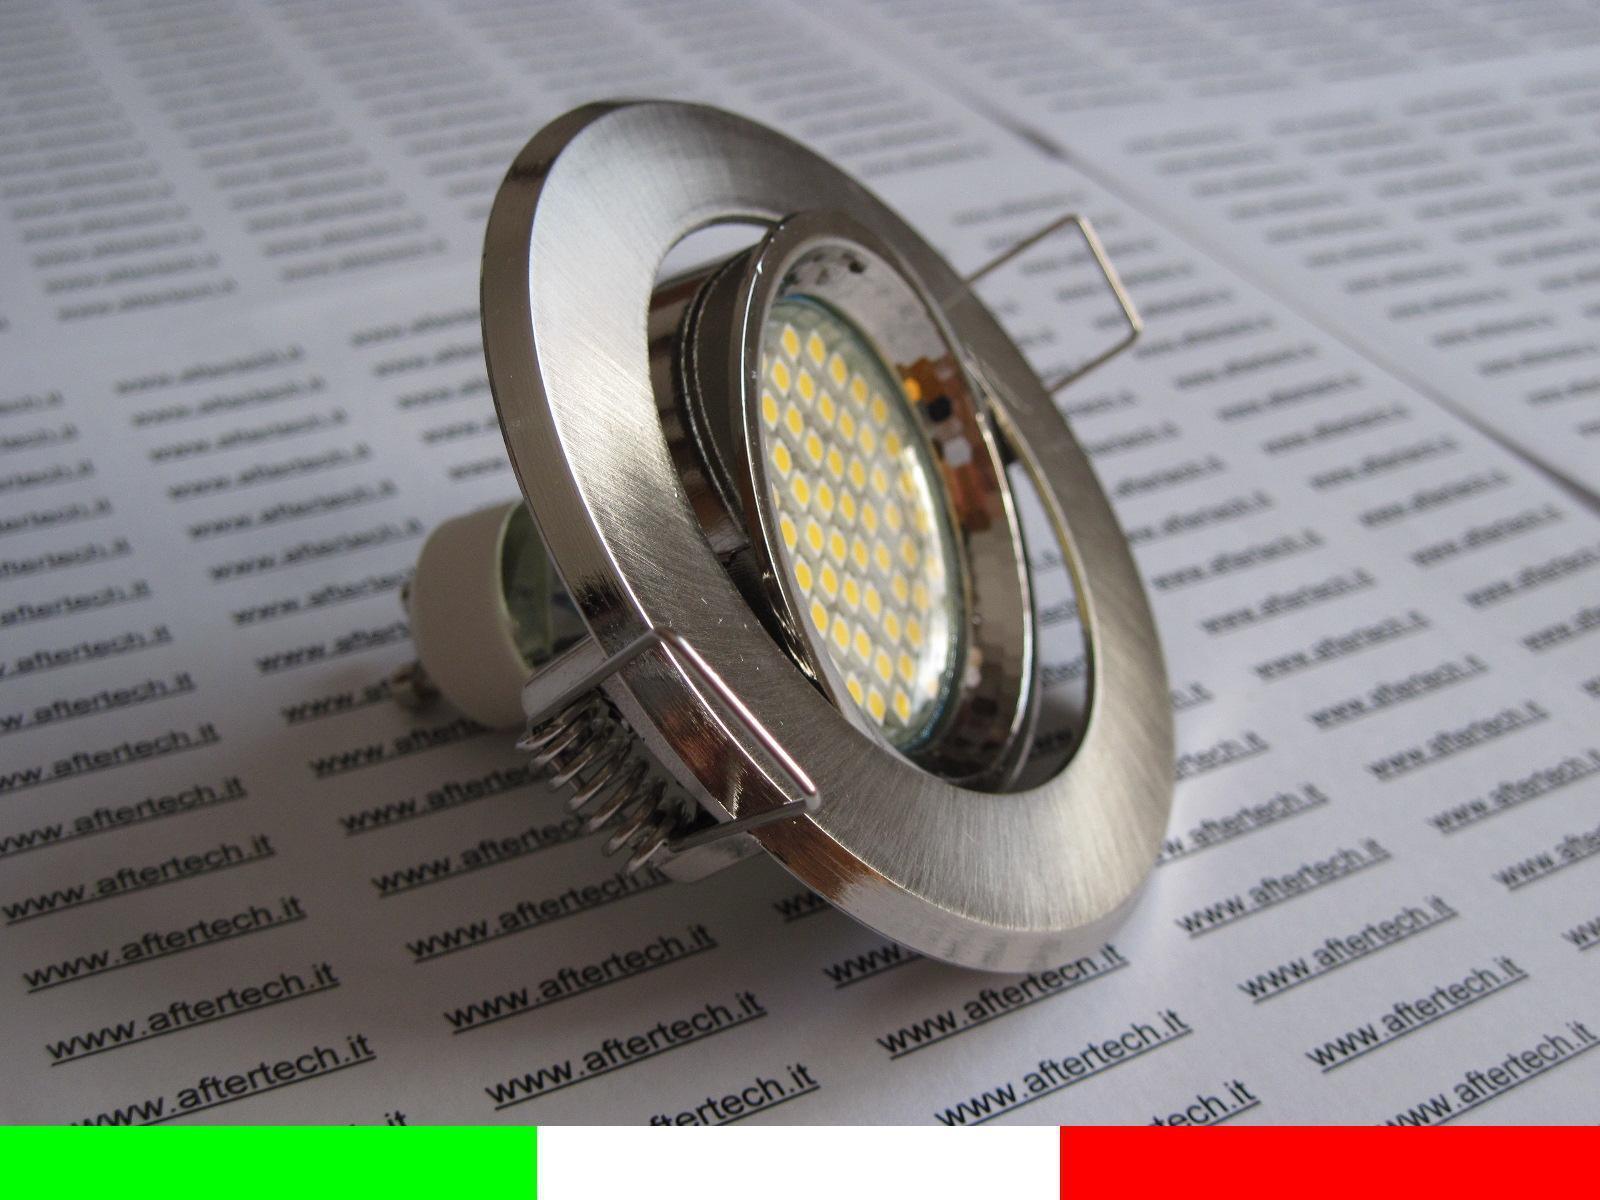 10 x 60 LED Recessed Spotlicht 120 ° Gu10 Warm Weiß 3,5w 220v Nan lichts